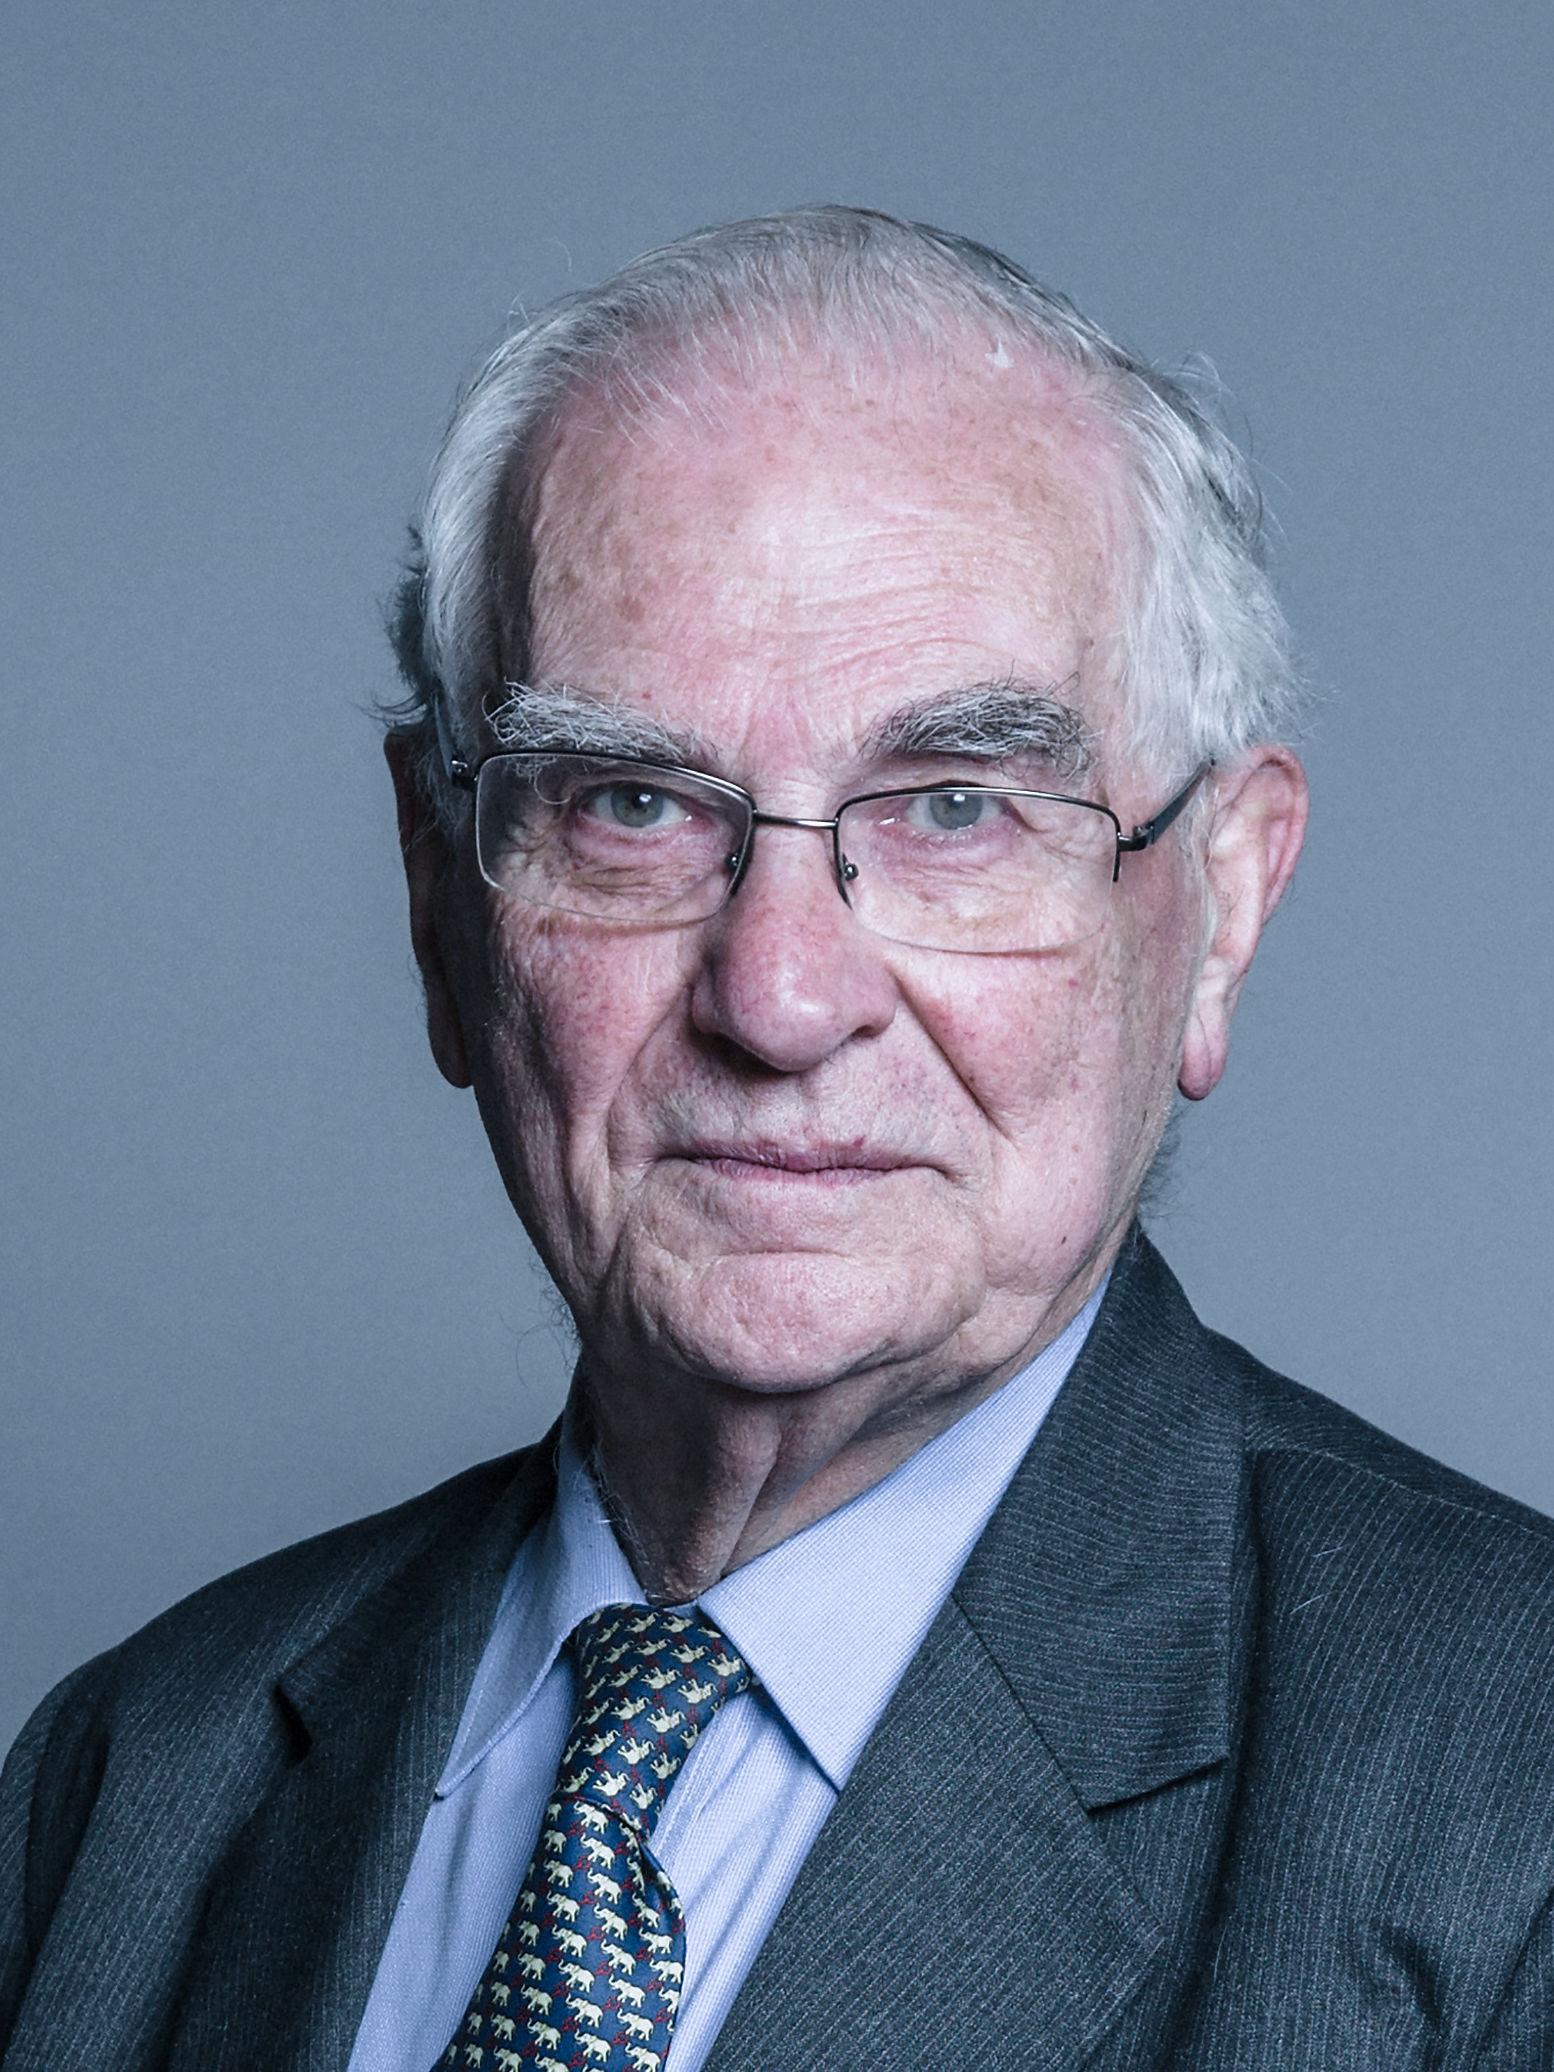 Ronald Oxburgh, Baron Oxburgh